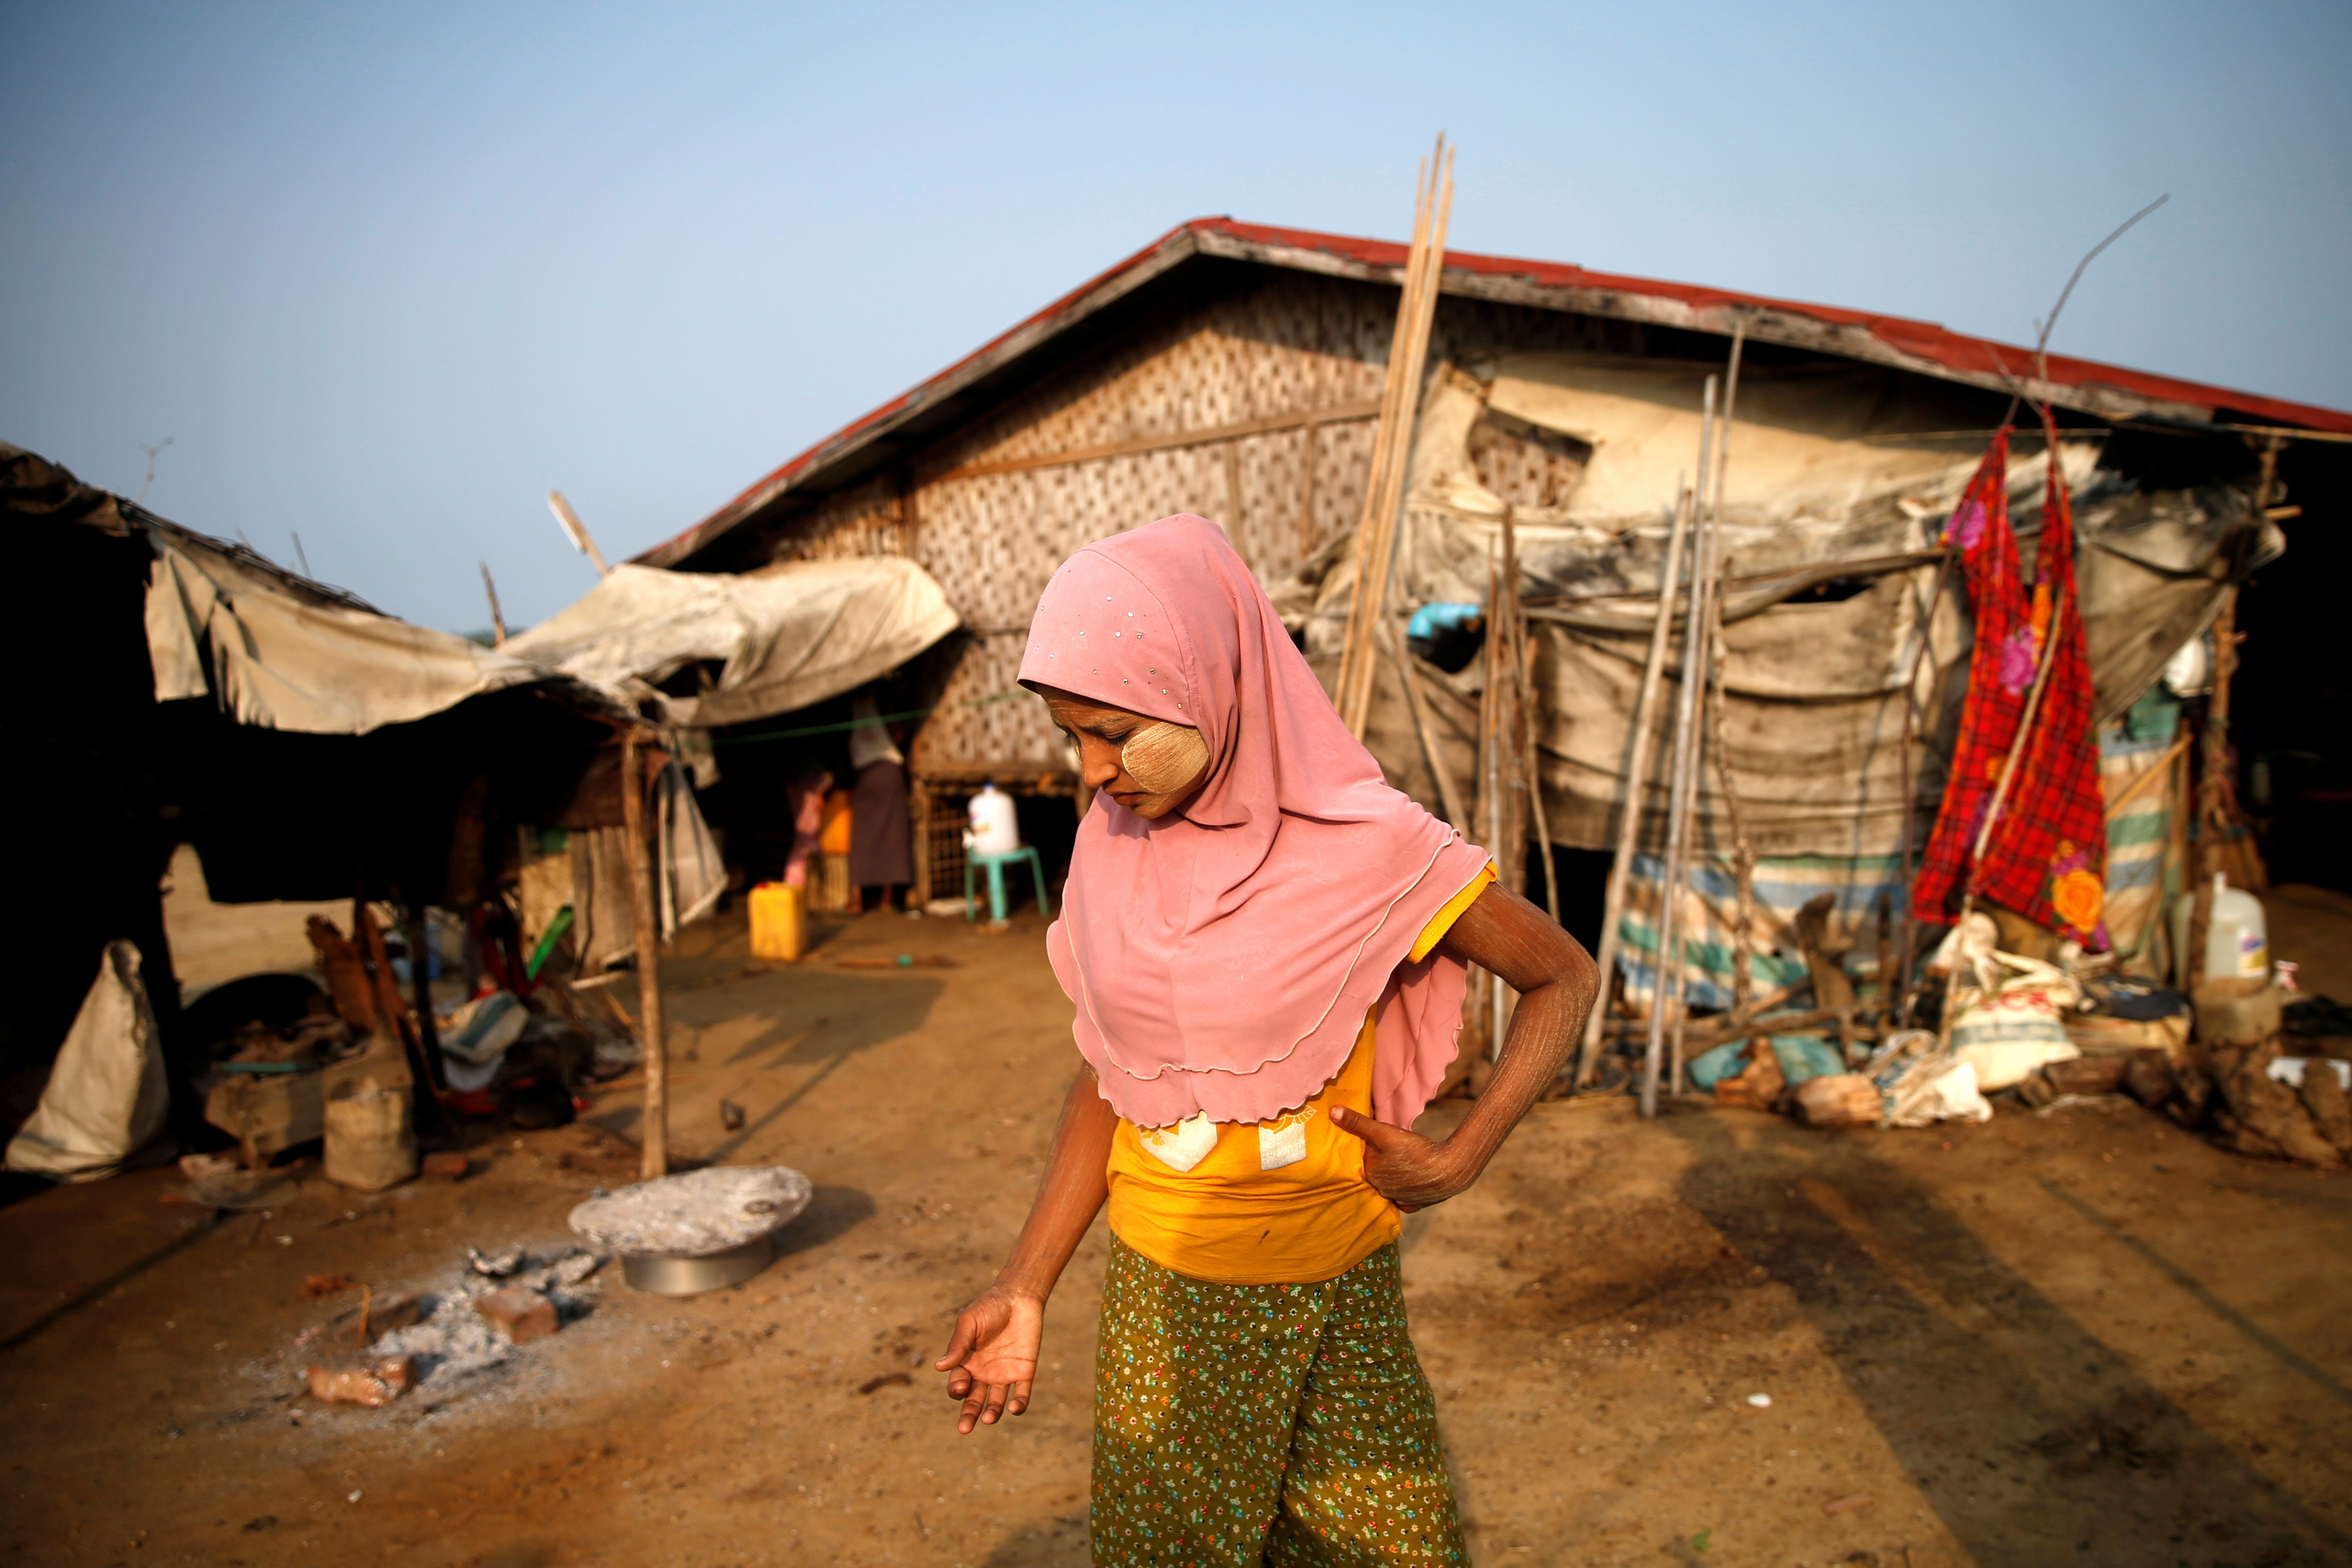 A Rohingya woman walks in a  refugee camp outside Kyaukpyu in Rakhine state, Myanmar May 18, 2017. Picture Taken May 18, 2017. REUTERS/Soe Zeya Tun